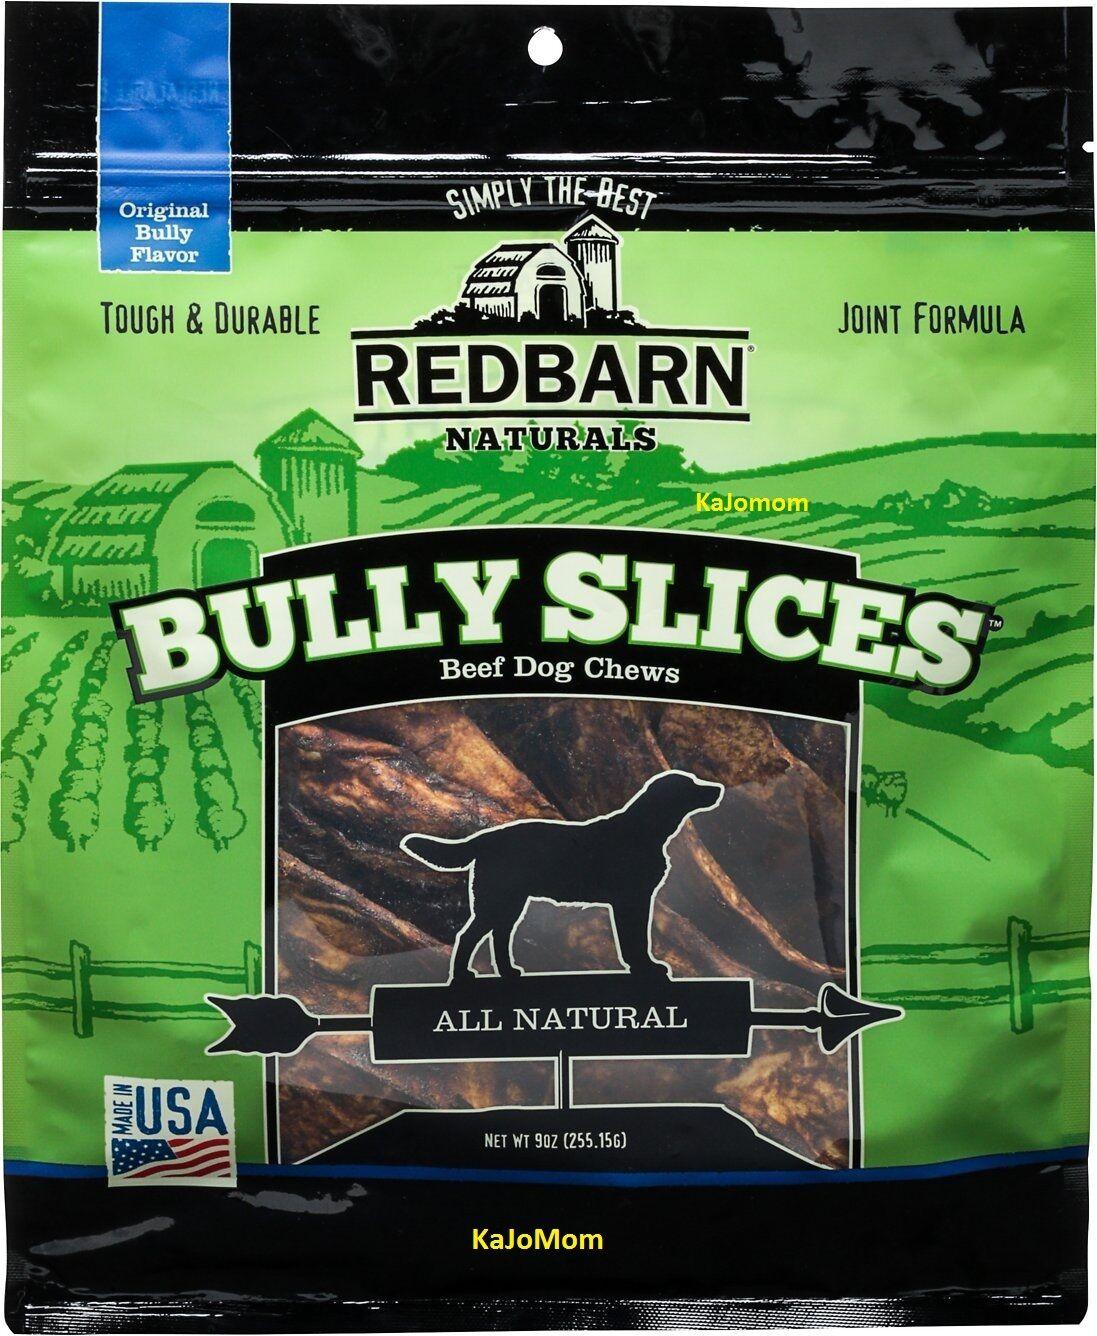 6 Bags RedBarn BULLY SLICES 9oz Pet Dog Chews Treats Natural FRESH Sealed USA